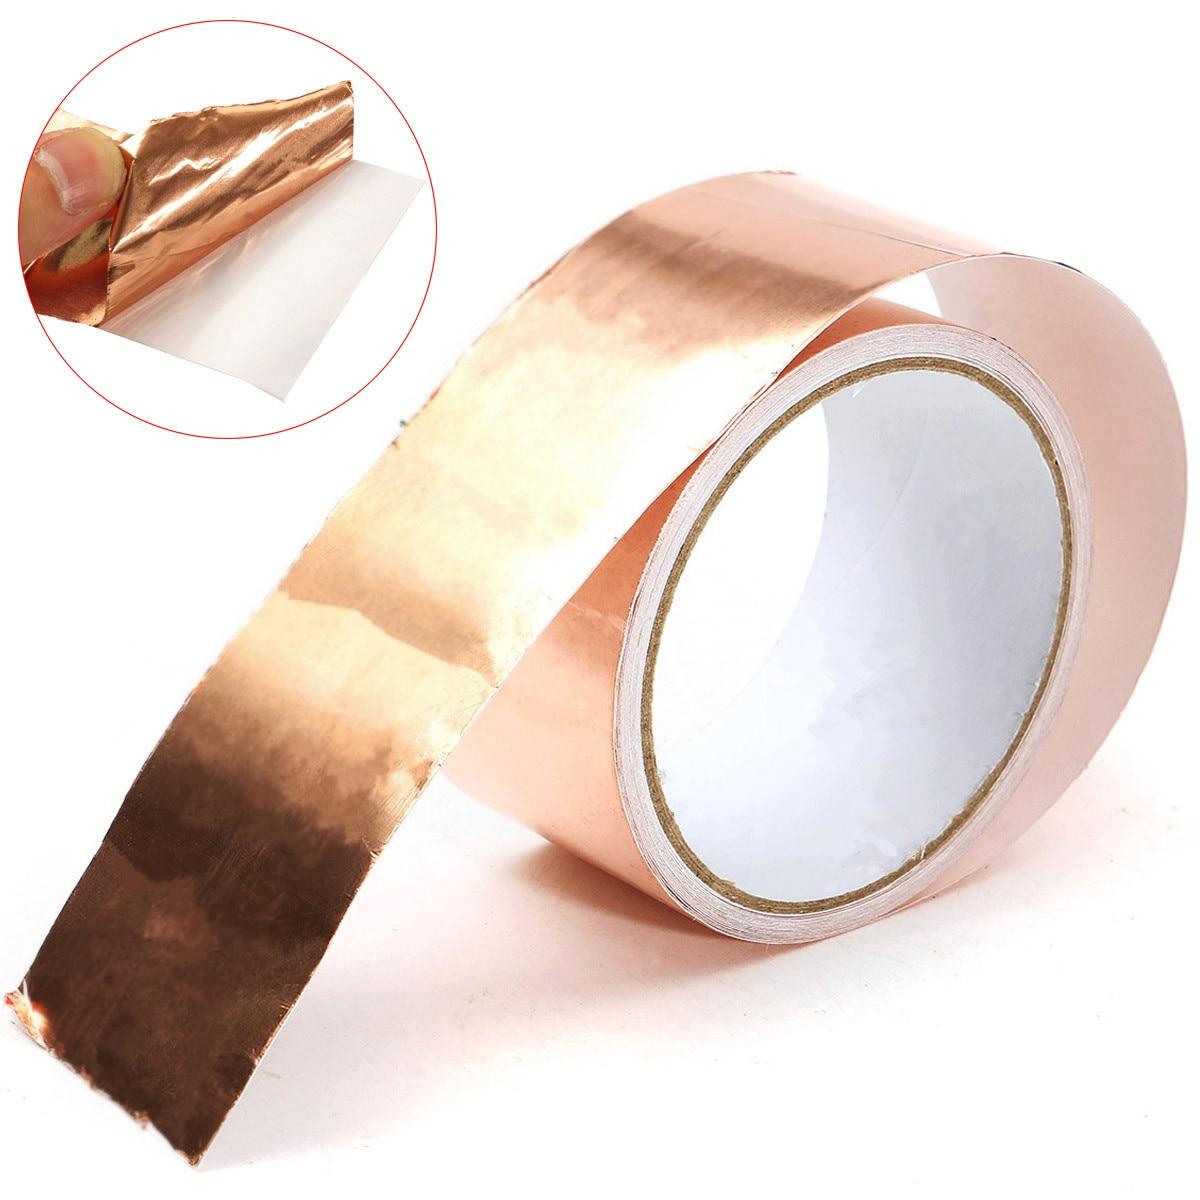 50mm X5m Pure Cooper Foil Tape EMI Single Side Conductive Foil Tape Strip Adhesive EMI Shielding Heat Resist Tape